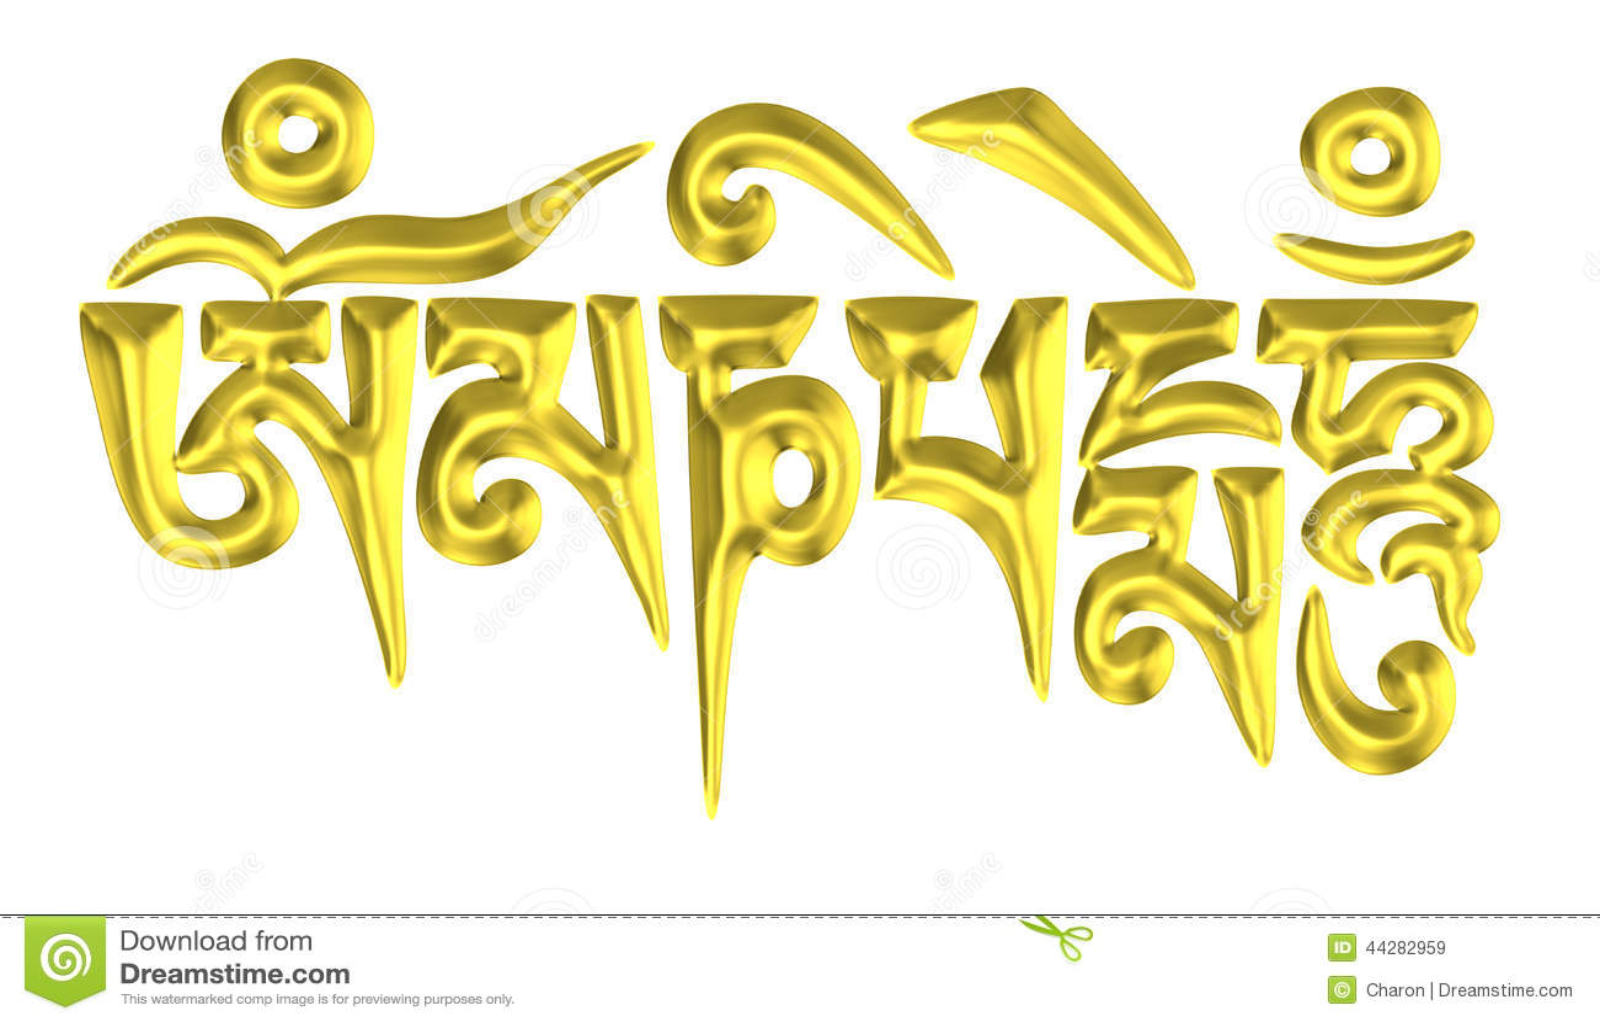 Golden Six Word Tibet Buddhism Mantra Stock Photo Image